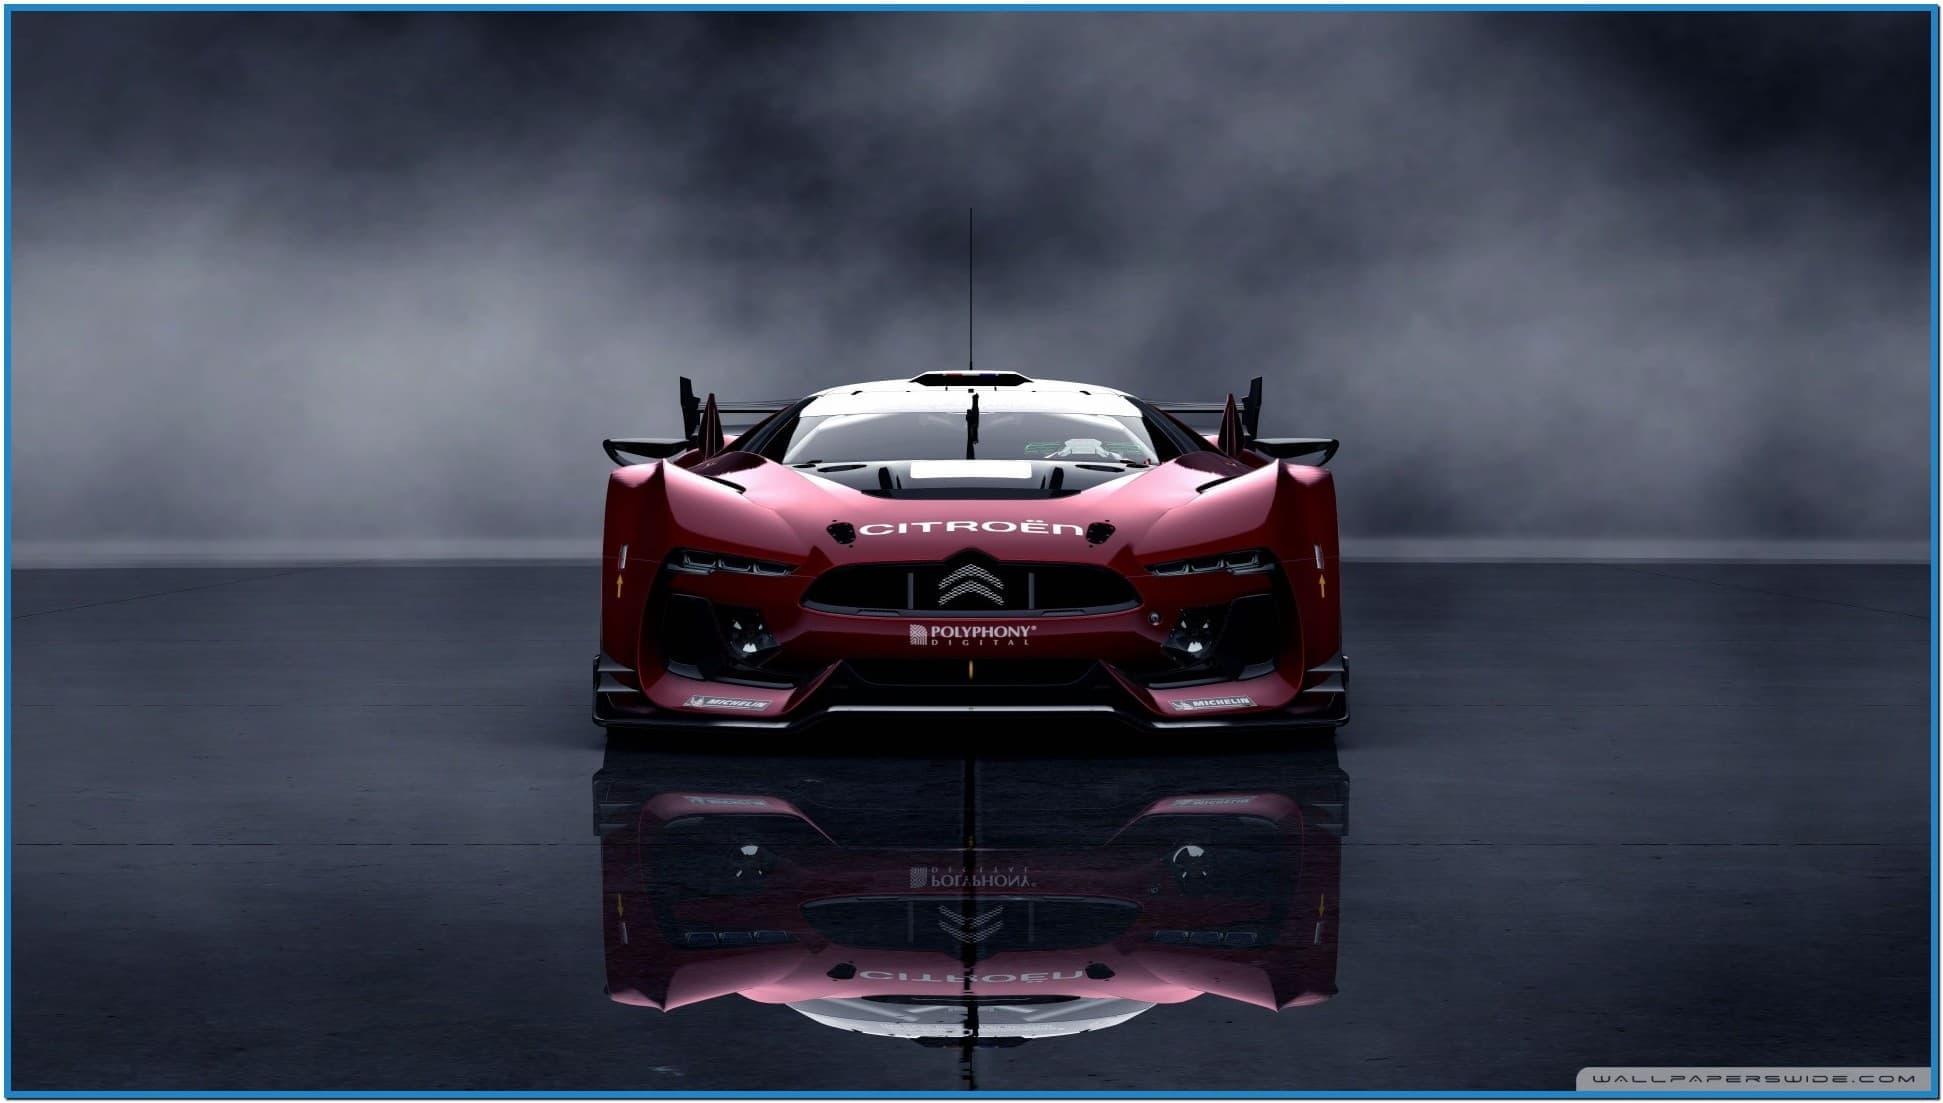 320x480 race car screensaver screensaver wallpaper Car Pictures 1943x1103